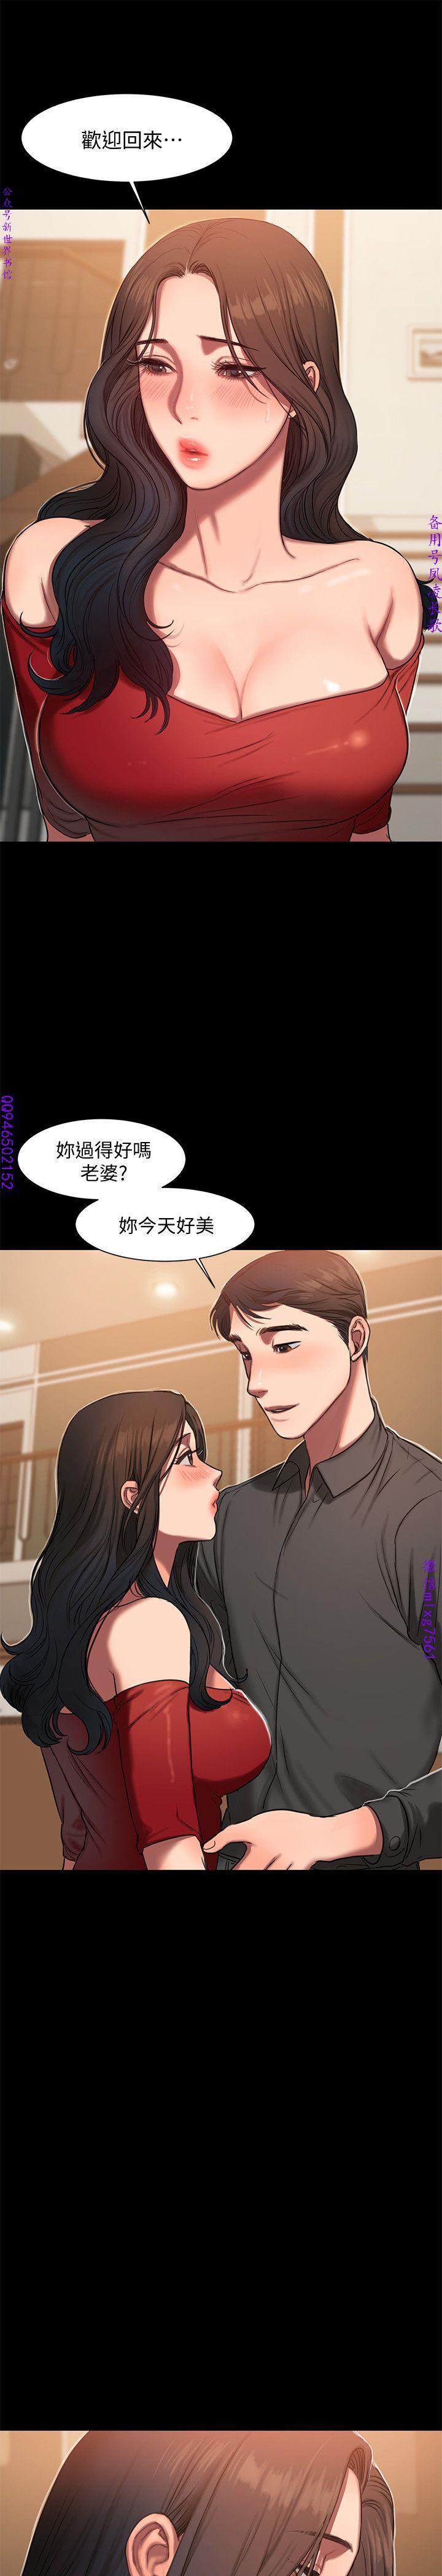 Run away 1-10【中文】 214